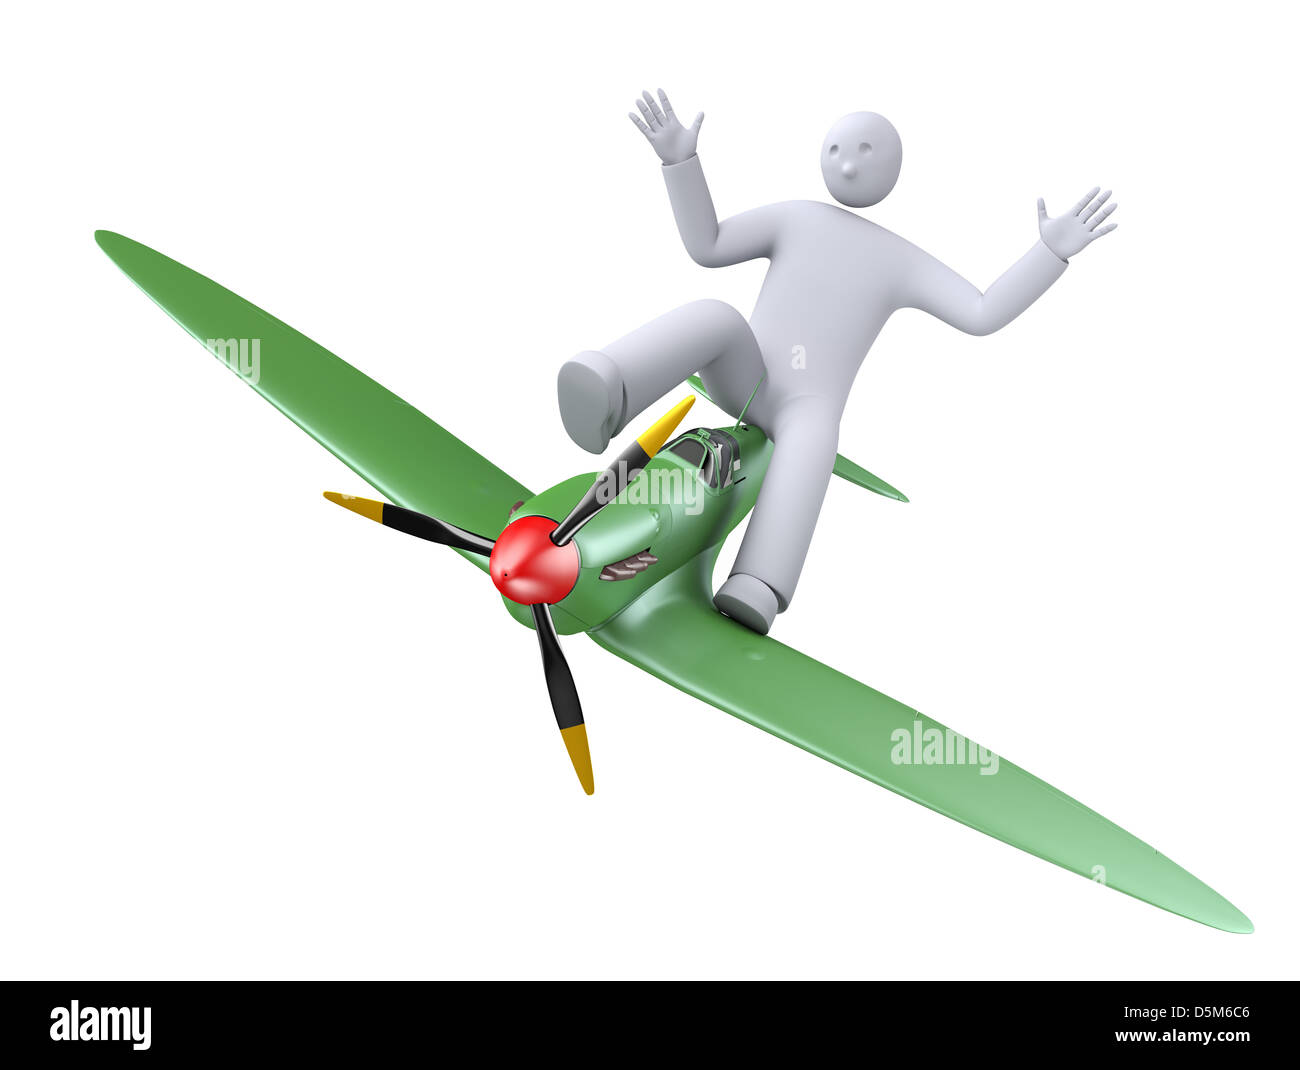 cartoon airplane flying stock photos u0026 cartoon airplane flying